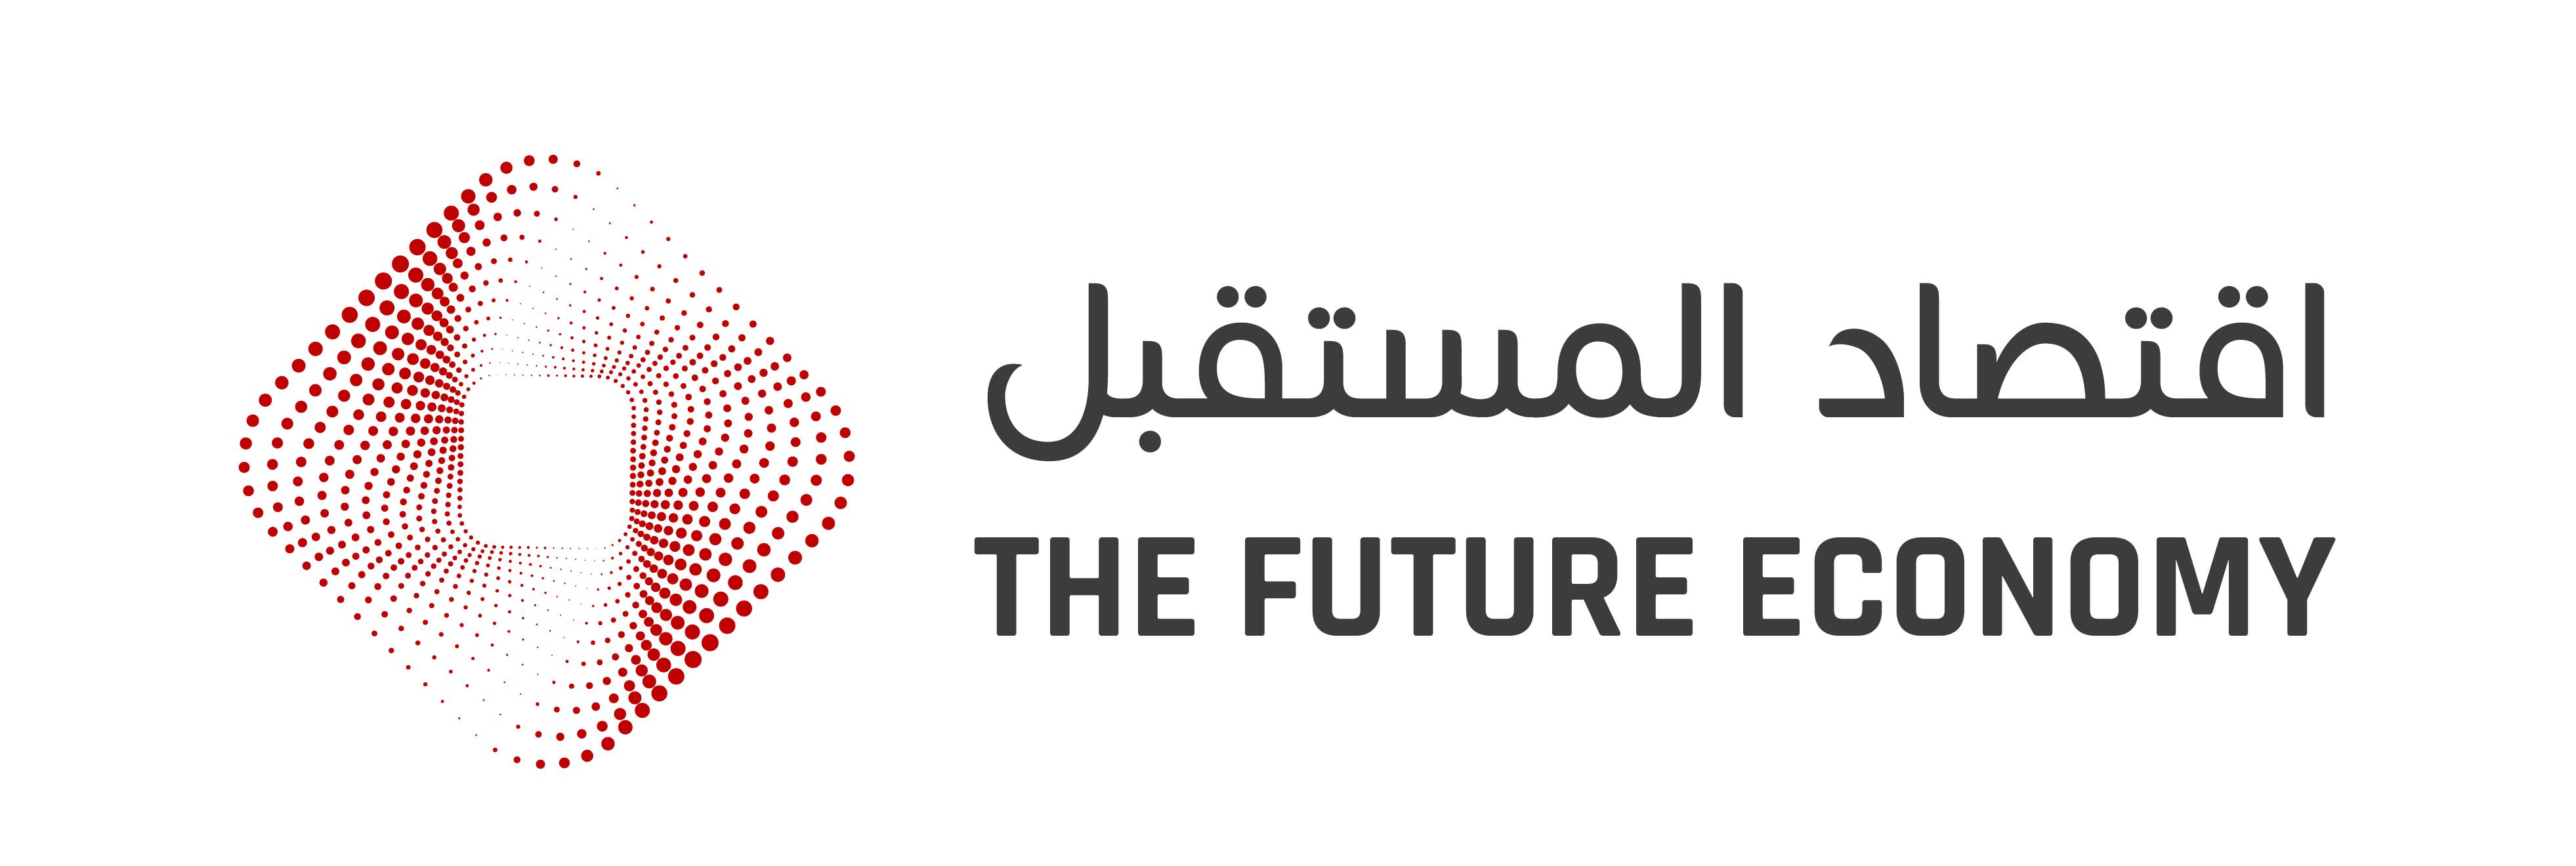 "abu dhabi the future economy ""أبوظبي.. اقتصاد المستقبل"""